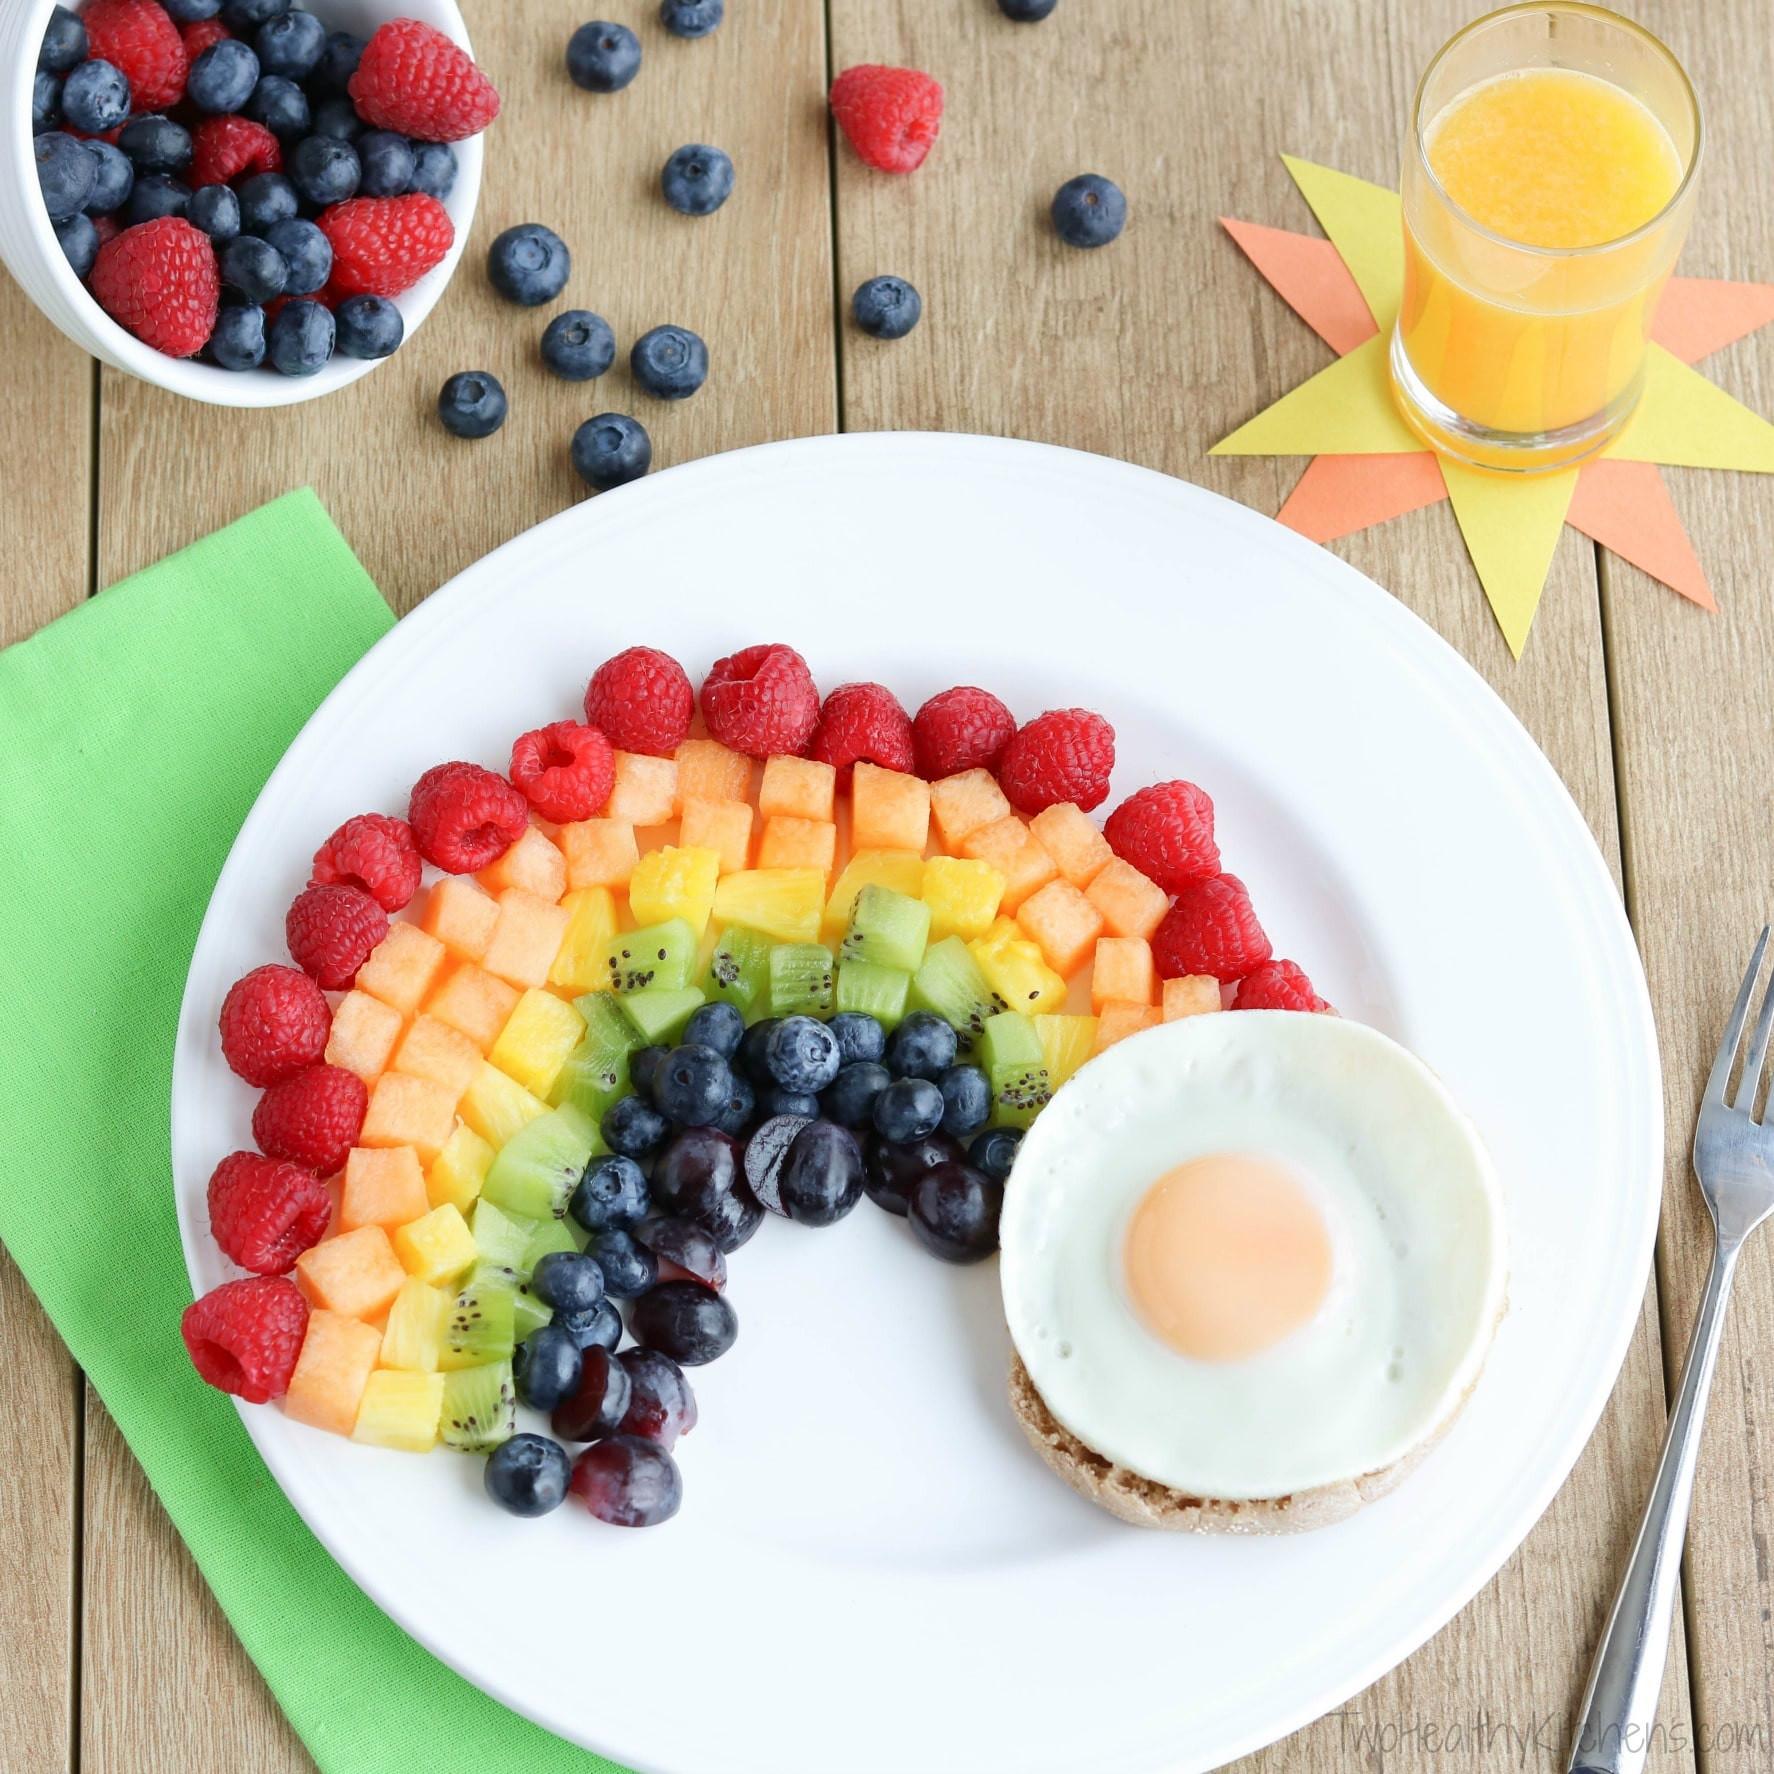 Healthy Fruit Breakfast  Fruit Rainbow with a Pot of Gold Fun Breakfast Idea for